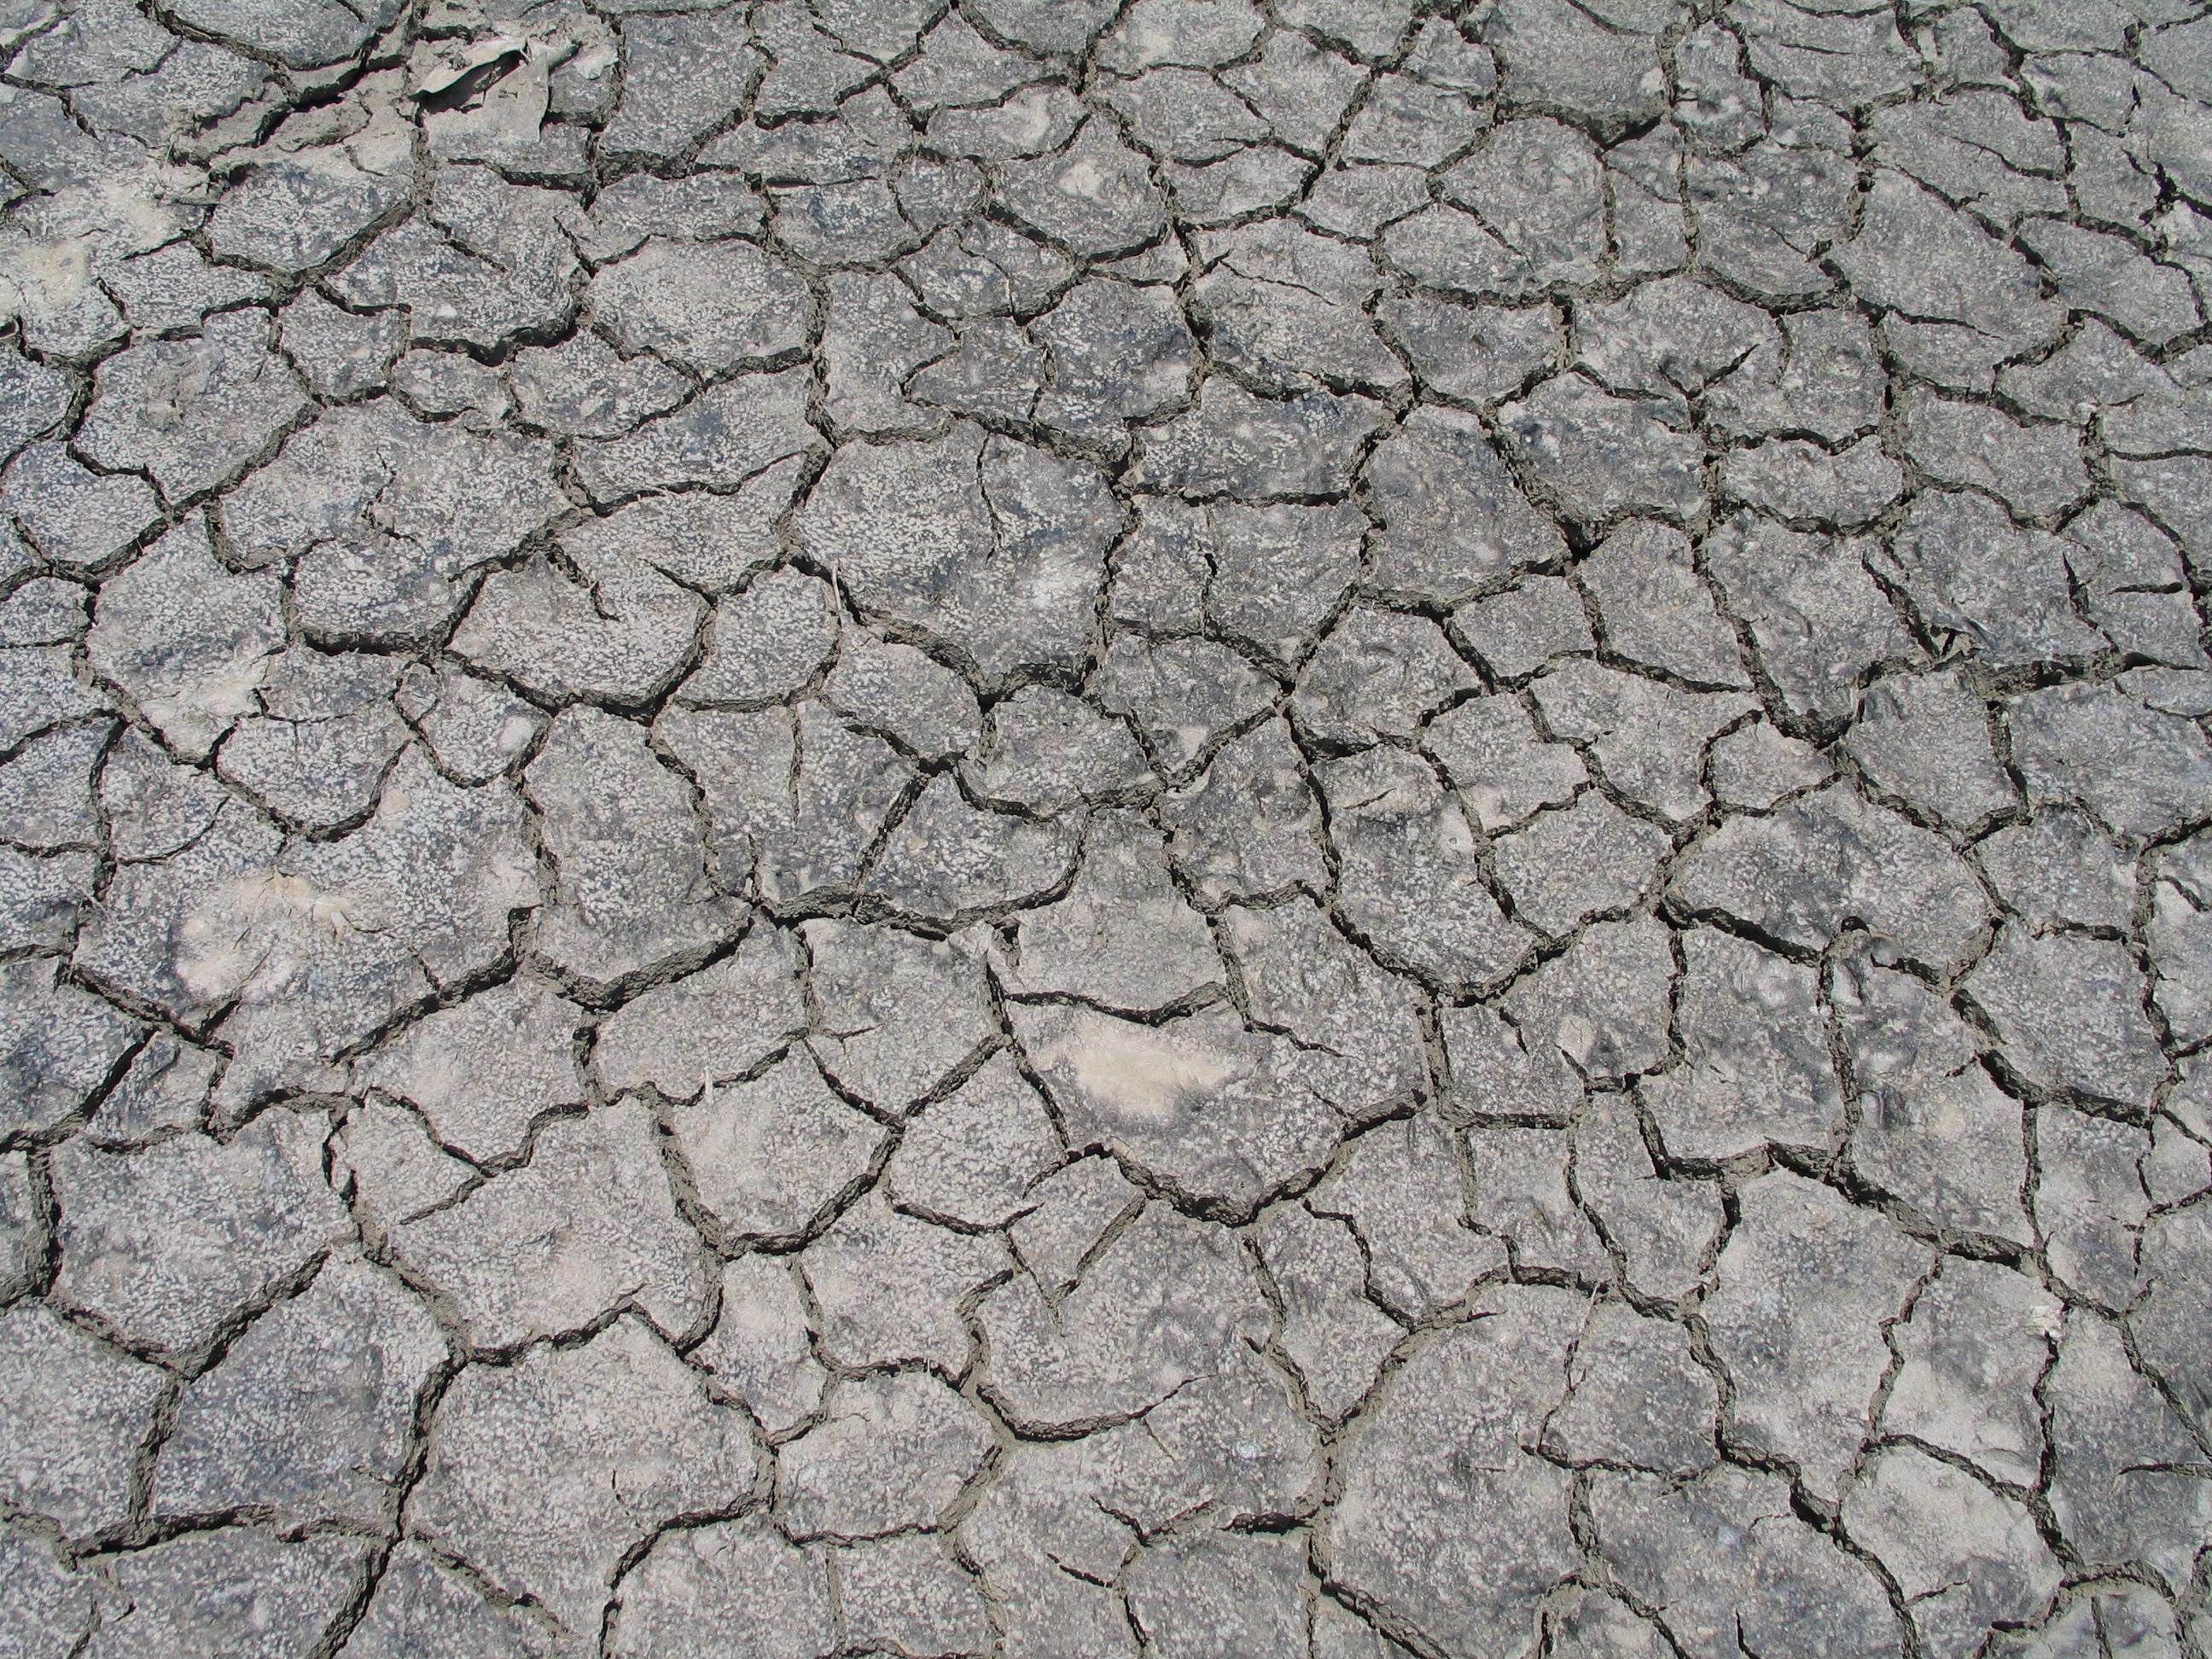 Cracked Ground Texture by Tusserte